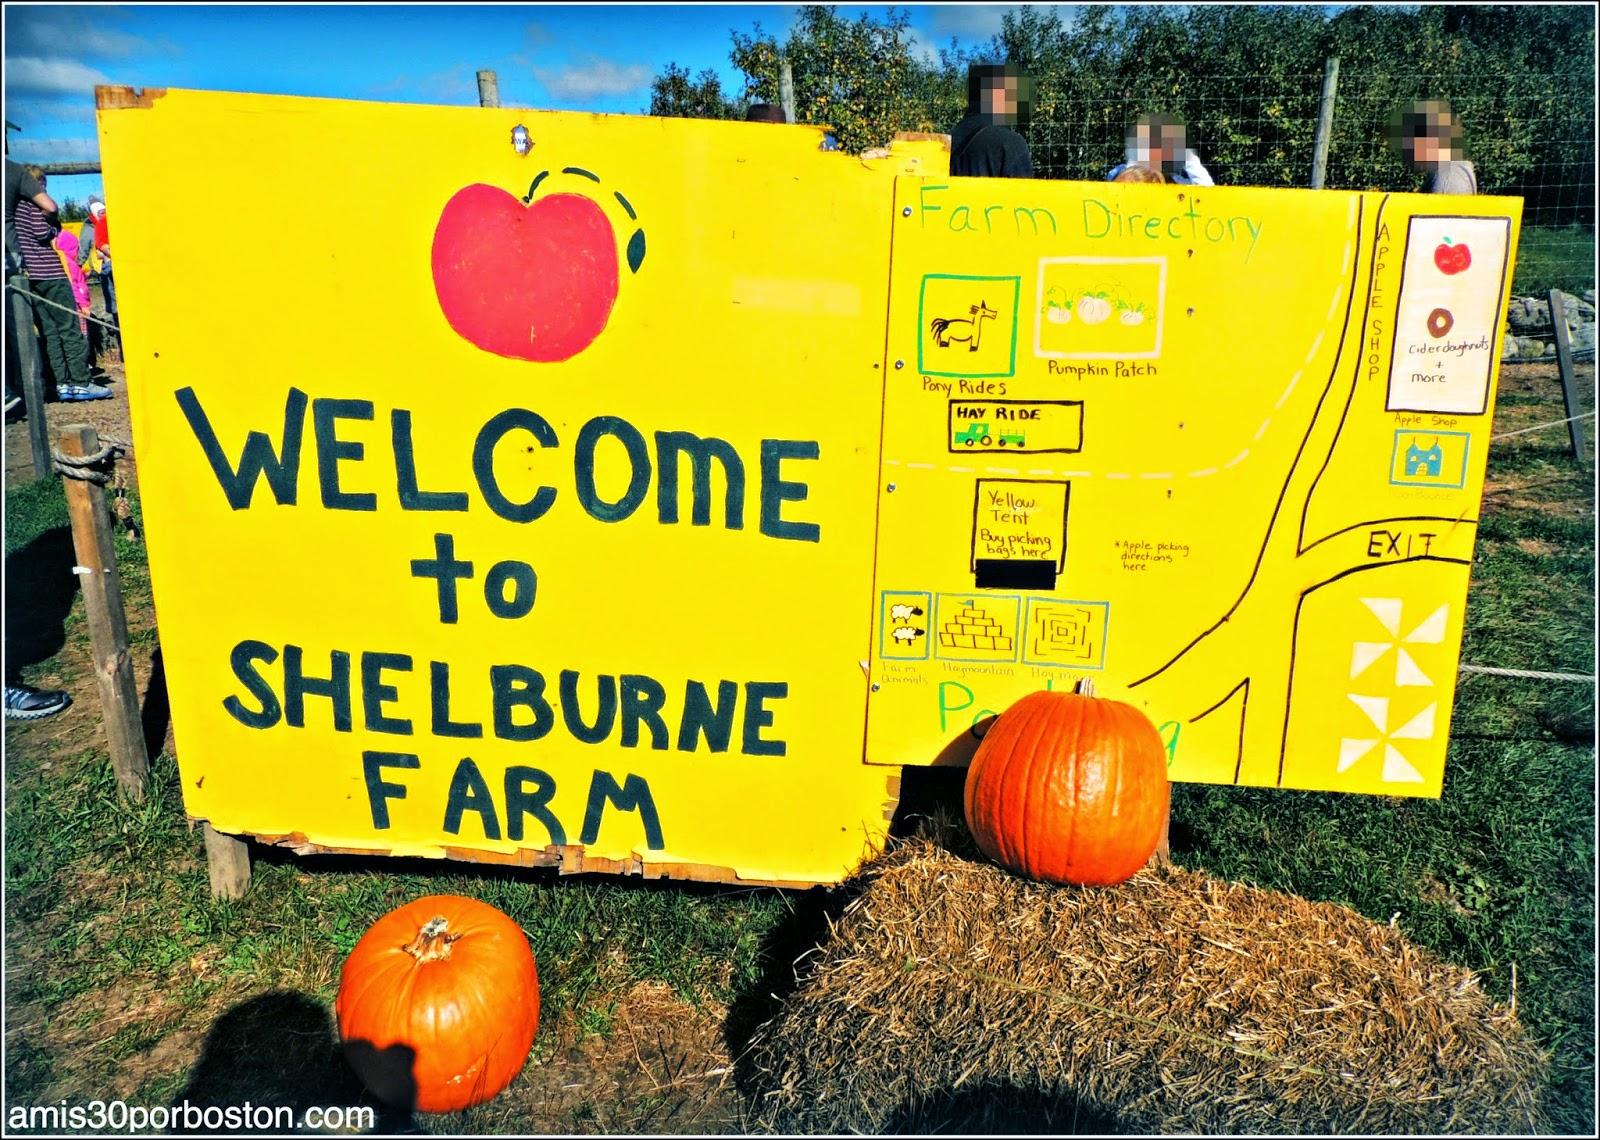 Cosecha de Manzanas: Shelburne Farm